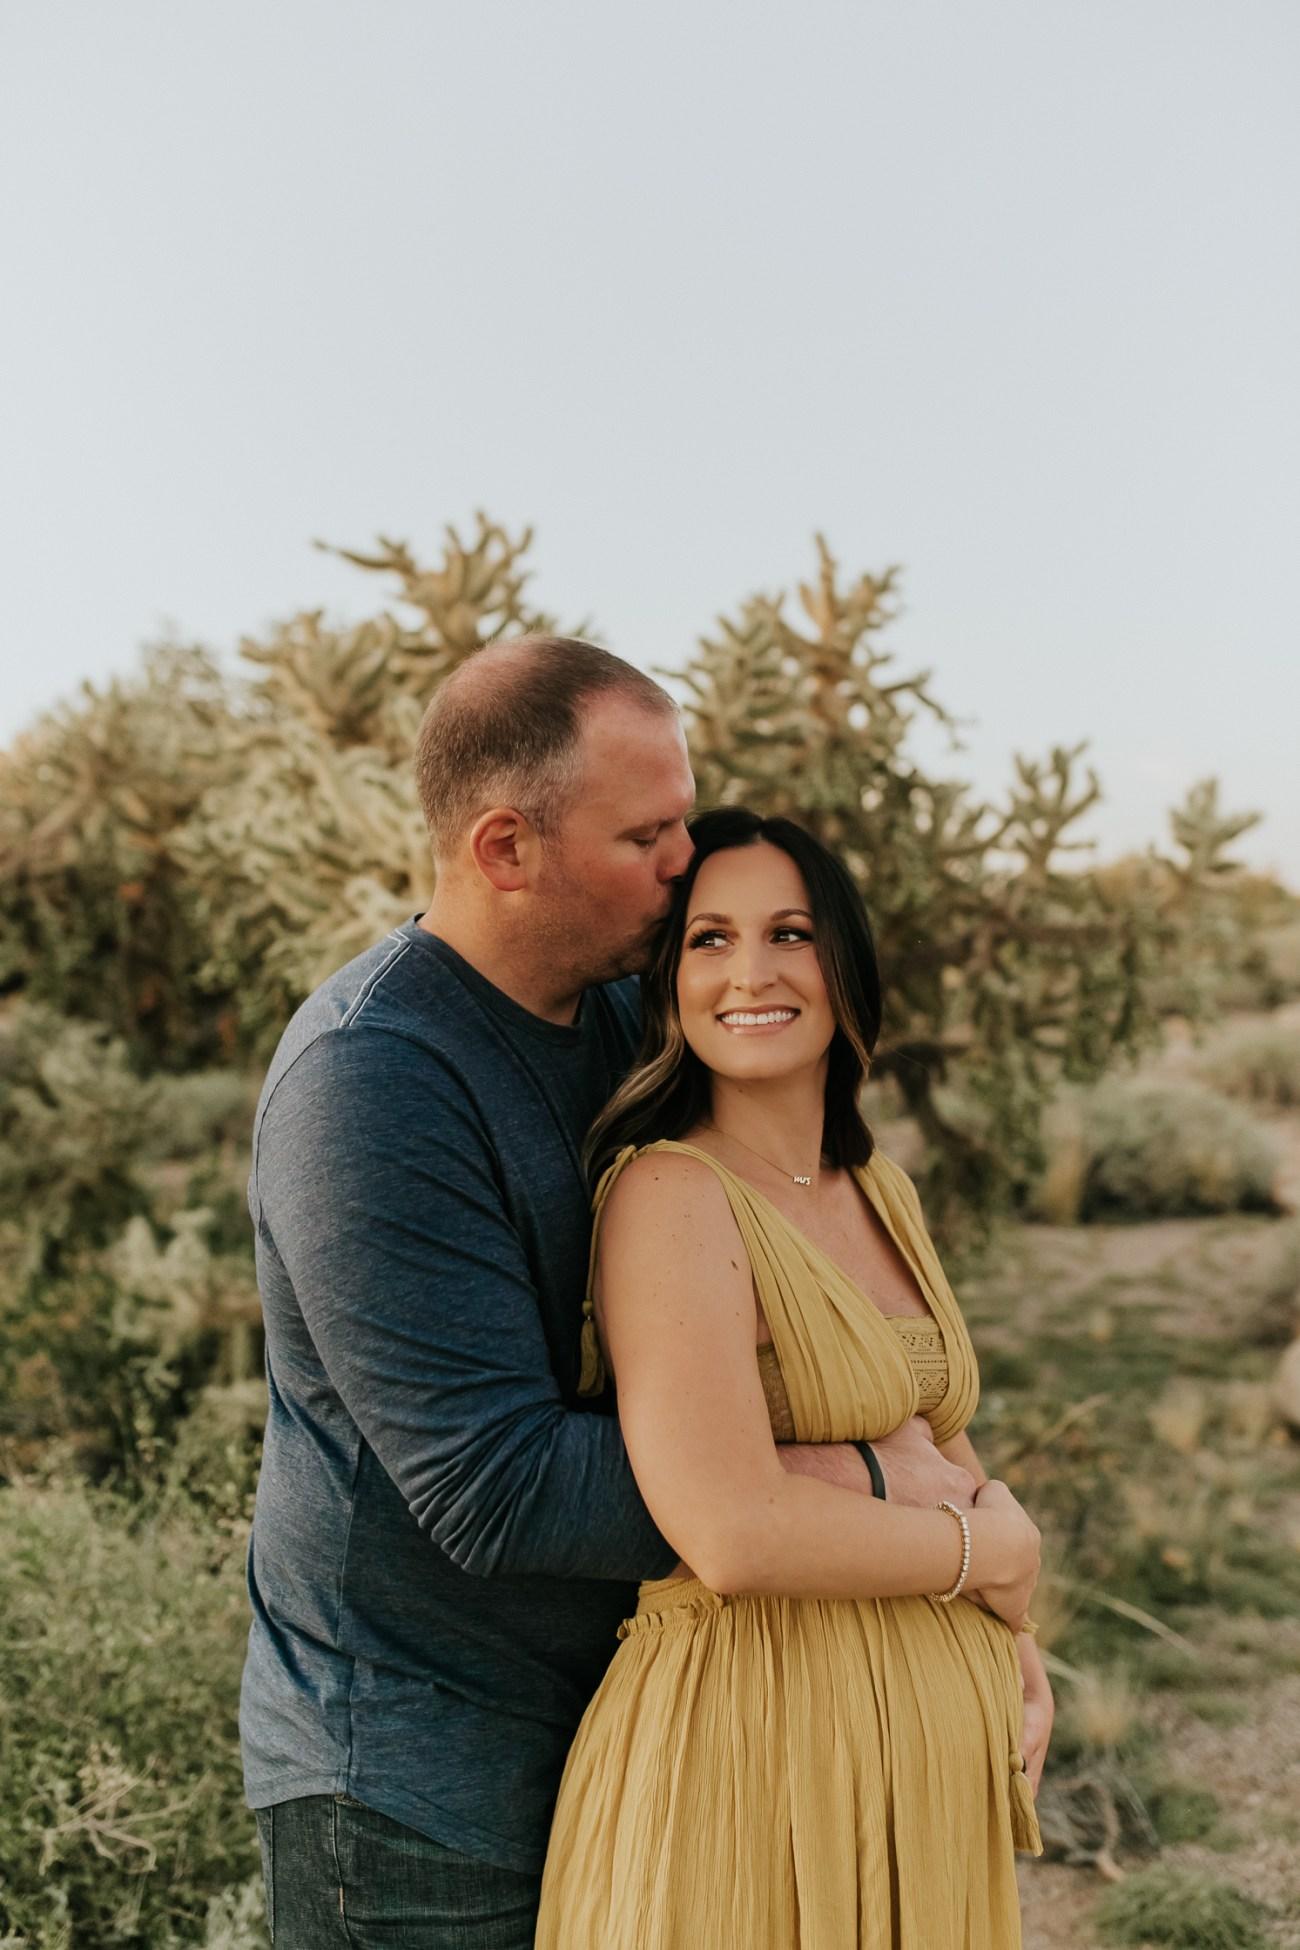 Megan Claire Photography | Phoenix Arizona Maternity and Newborn Photographer. Arizona desert maternity session @meganclairephoto